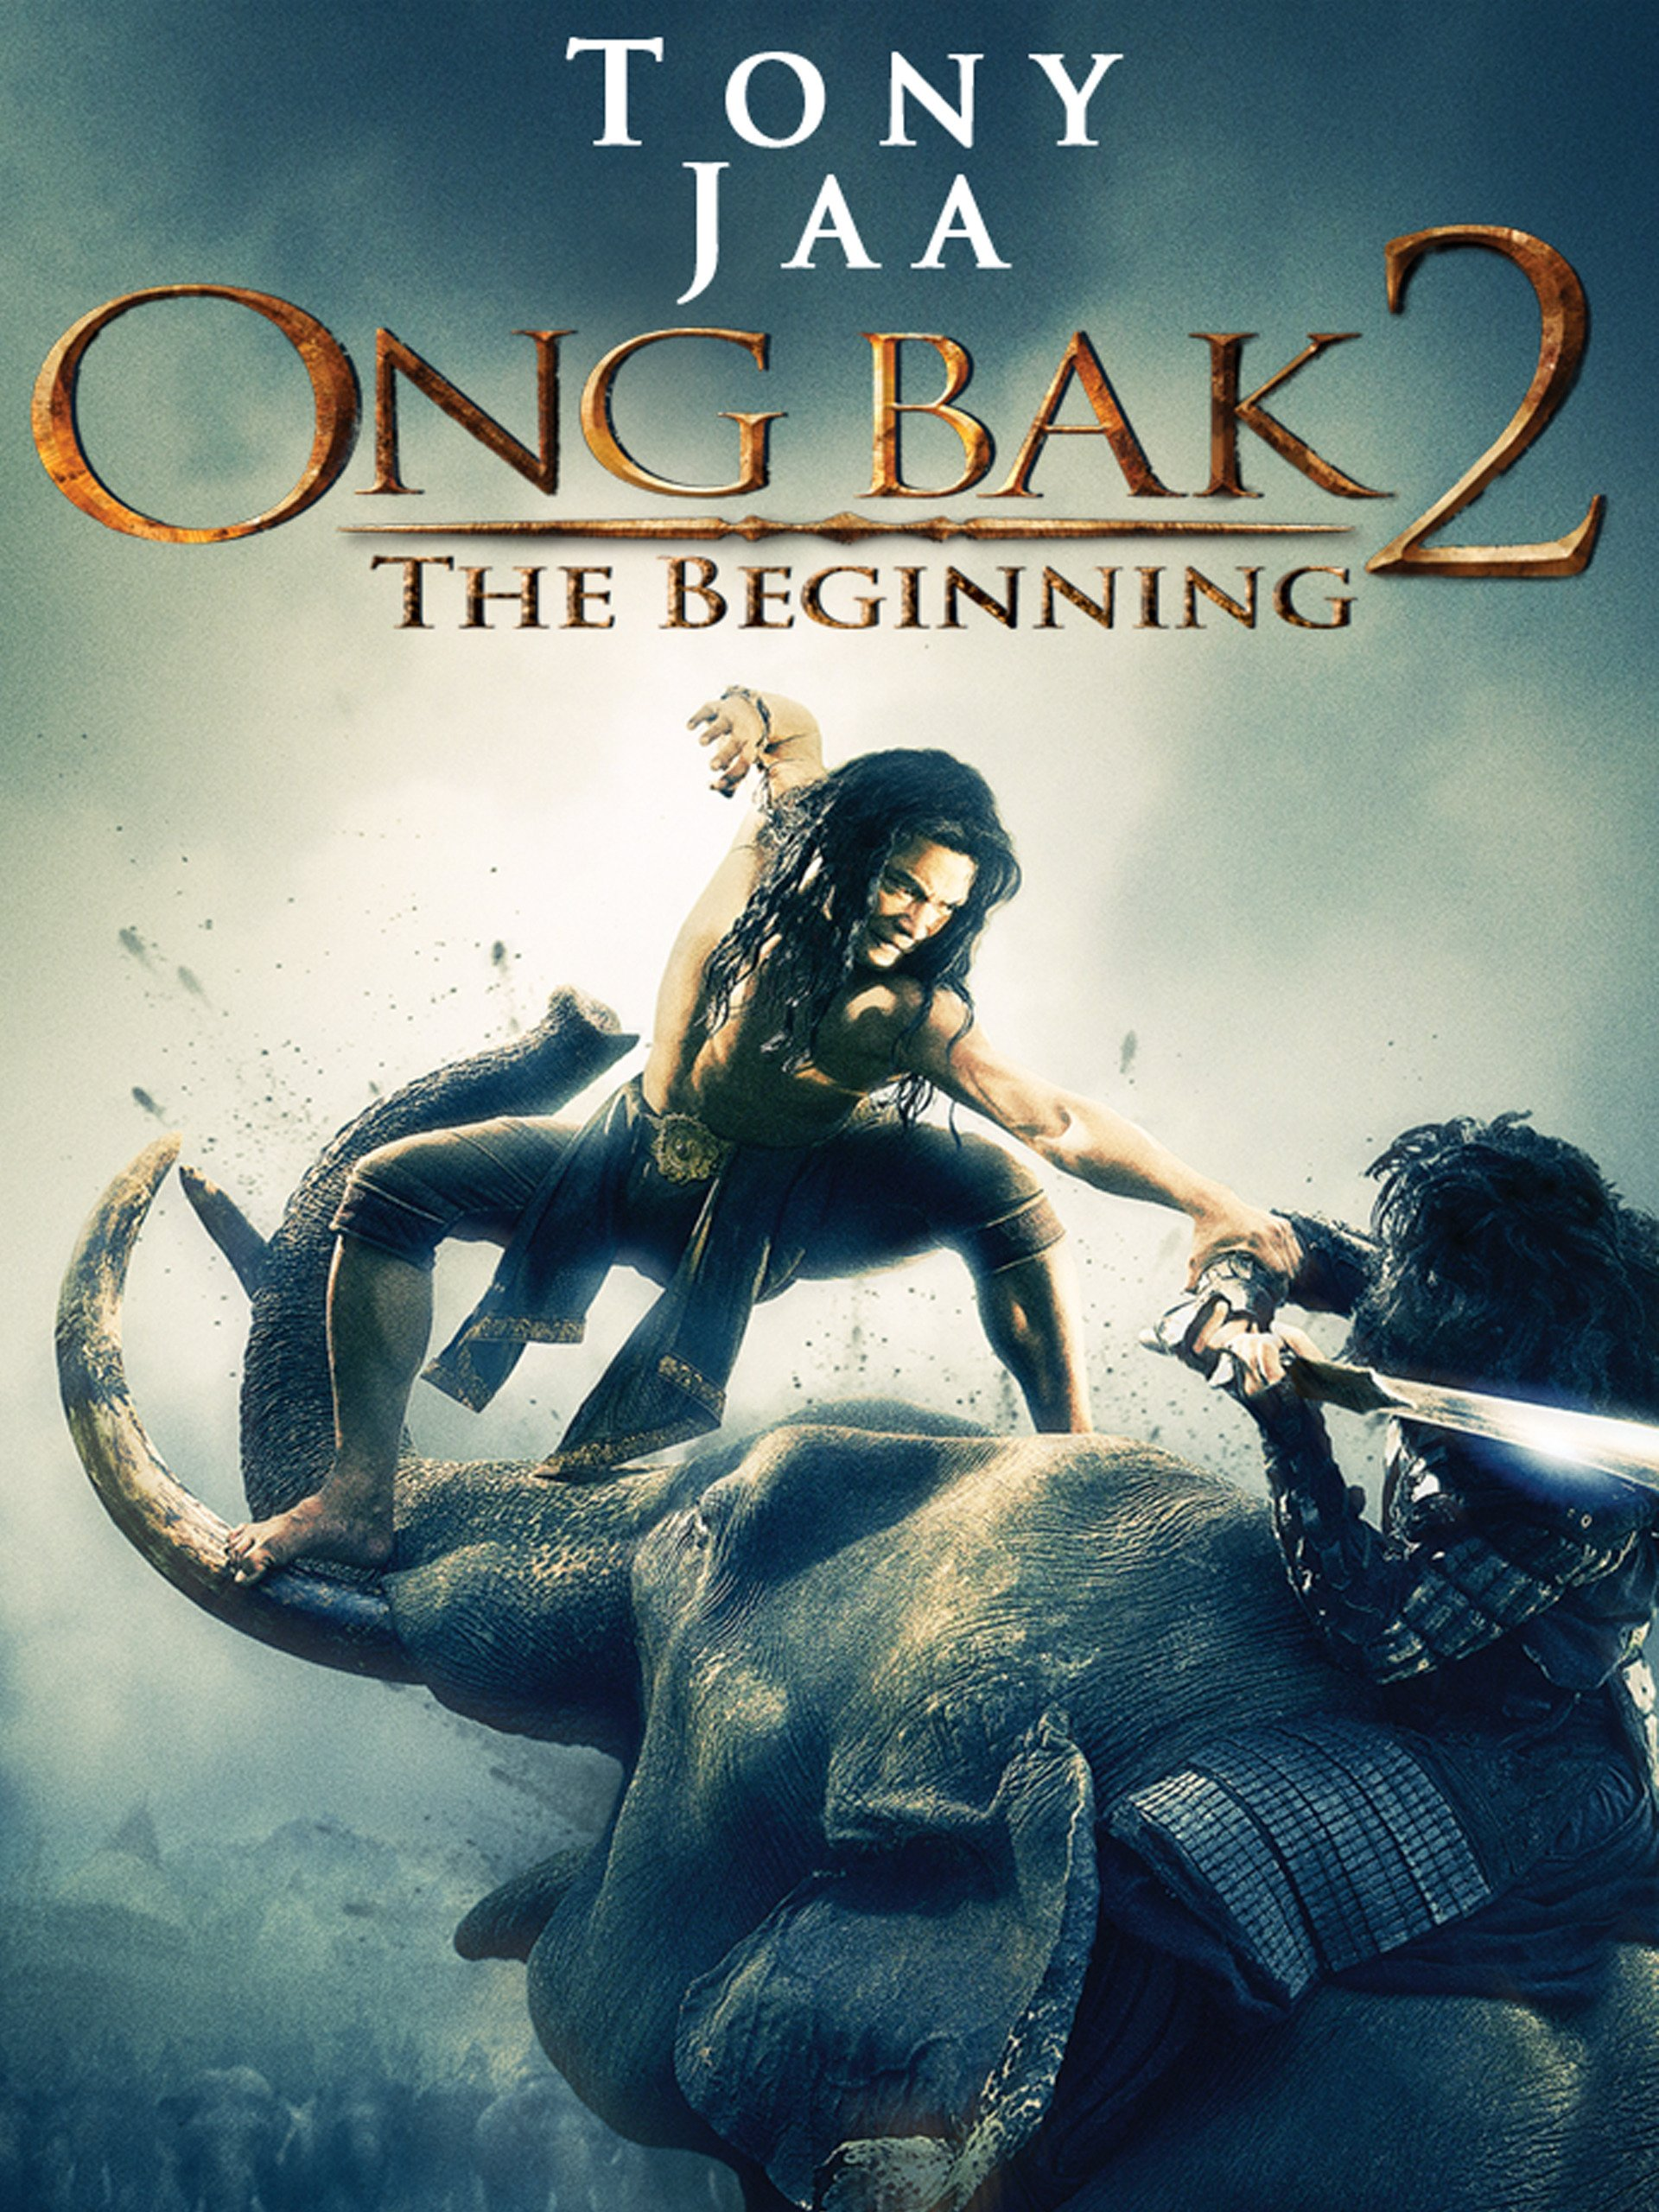 ong bak 2 full movie english version